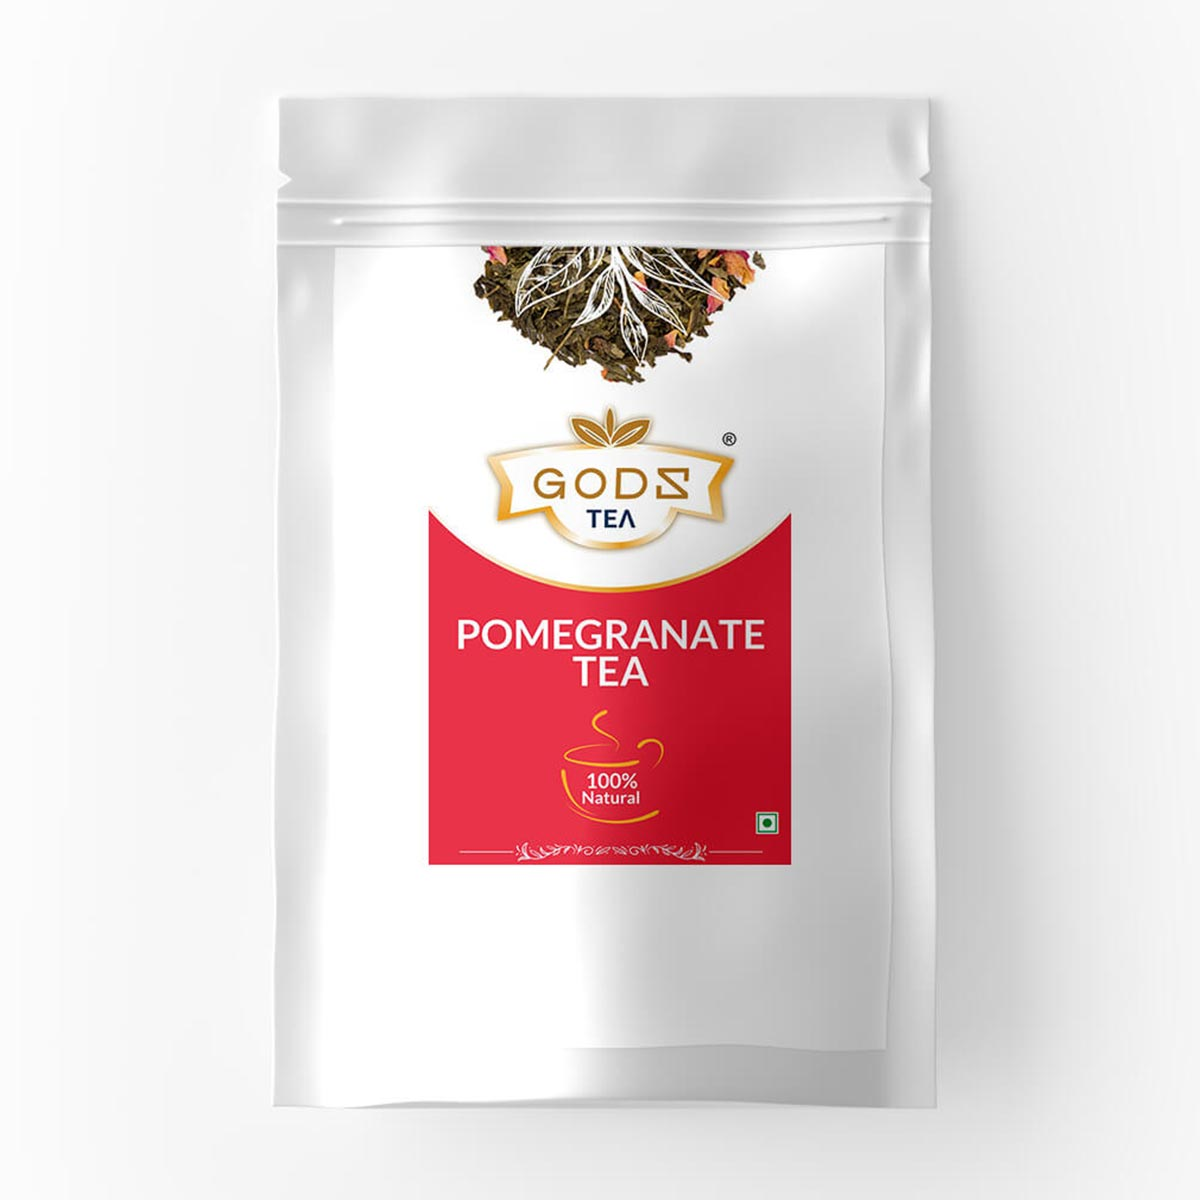 Herbal Pomegranate Tea